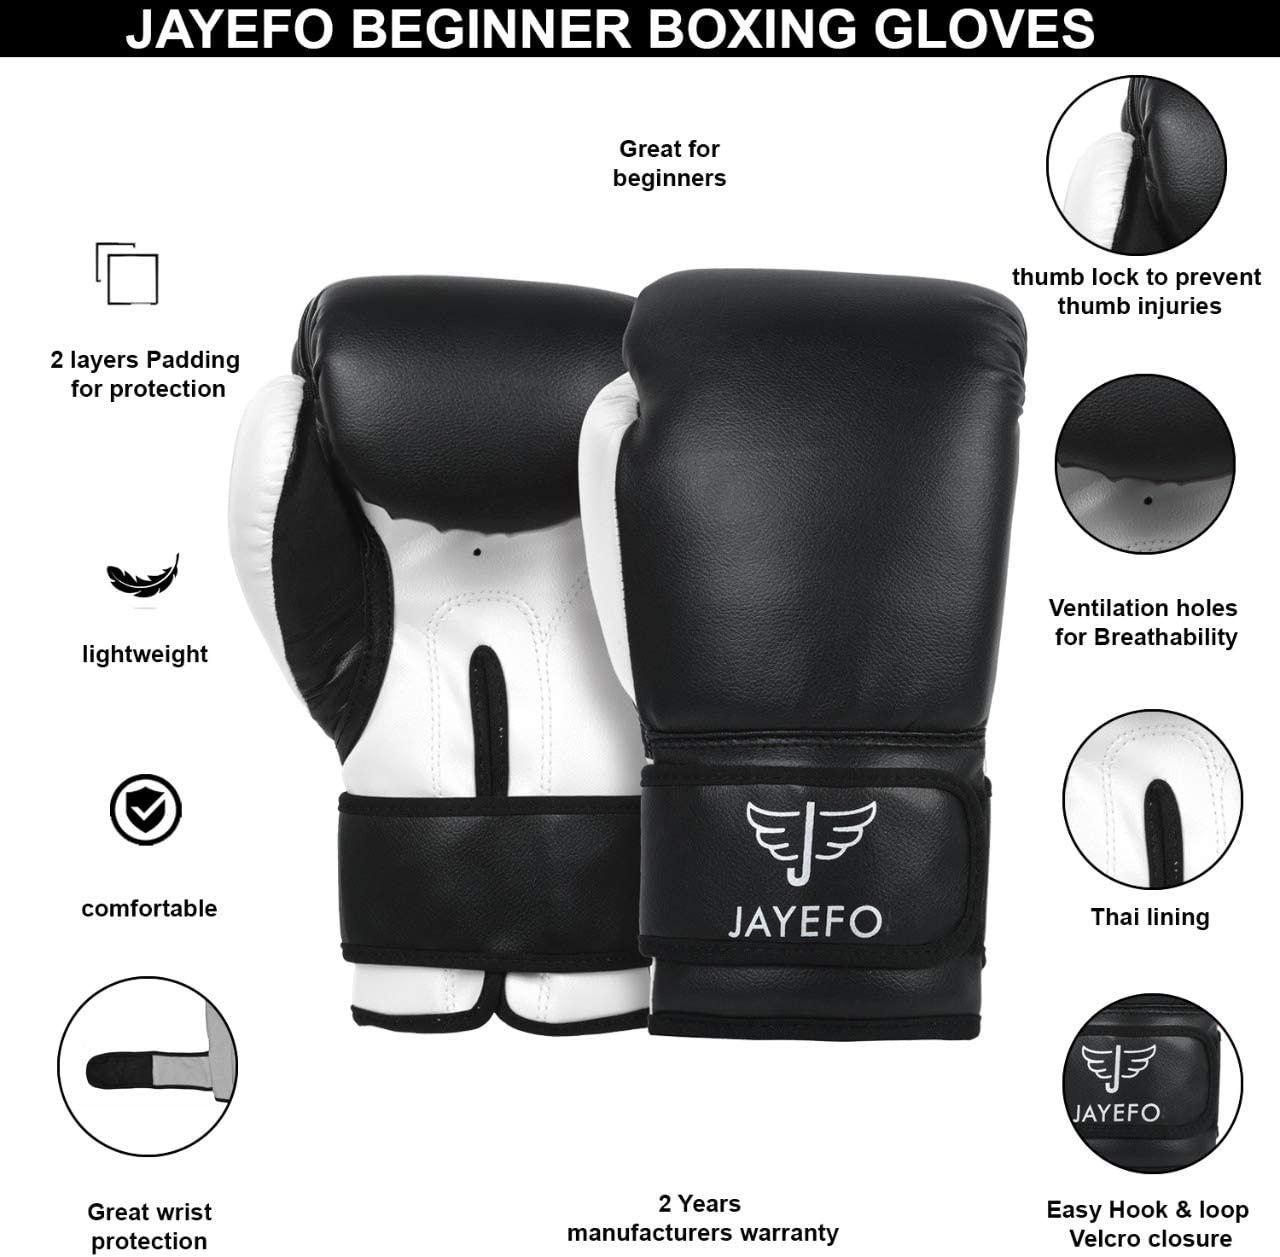 JAYEFO Beginners PRO Model Leather Boxing MMA Muay Thai Gloves {Punching Bag Gloves}{Kickboxing Gloves} {Sparring Gloves} MMA Gloves Bag Gloves